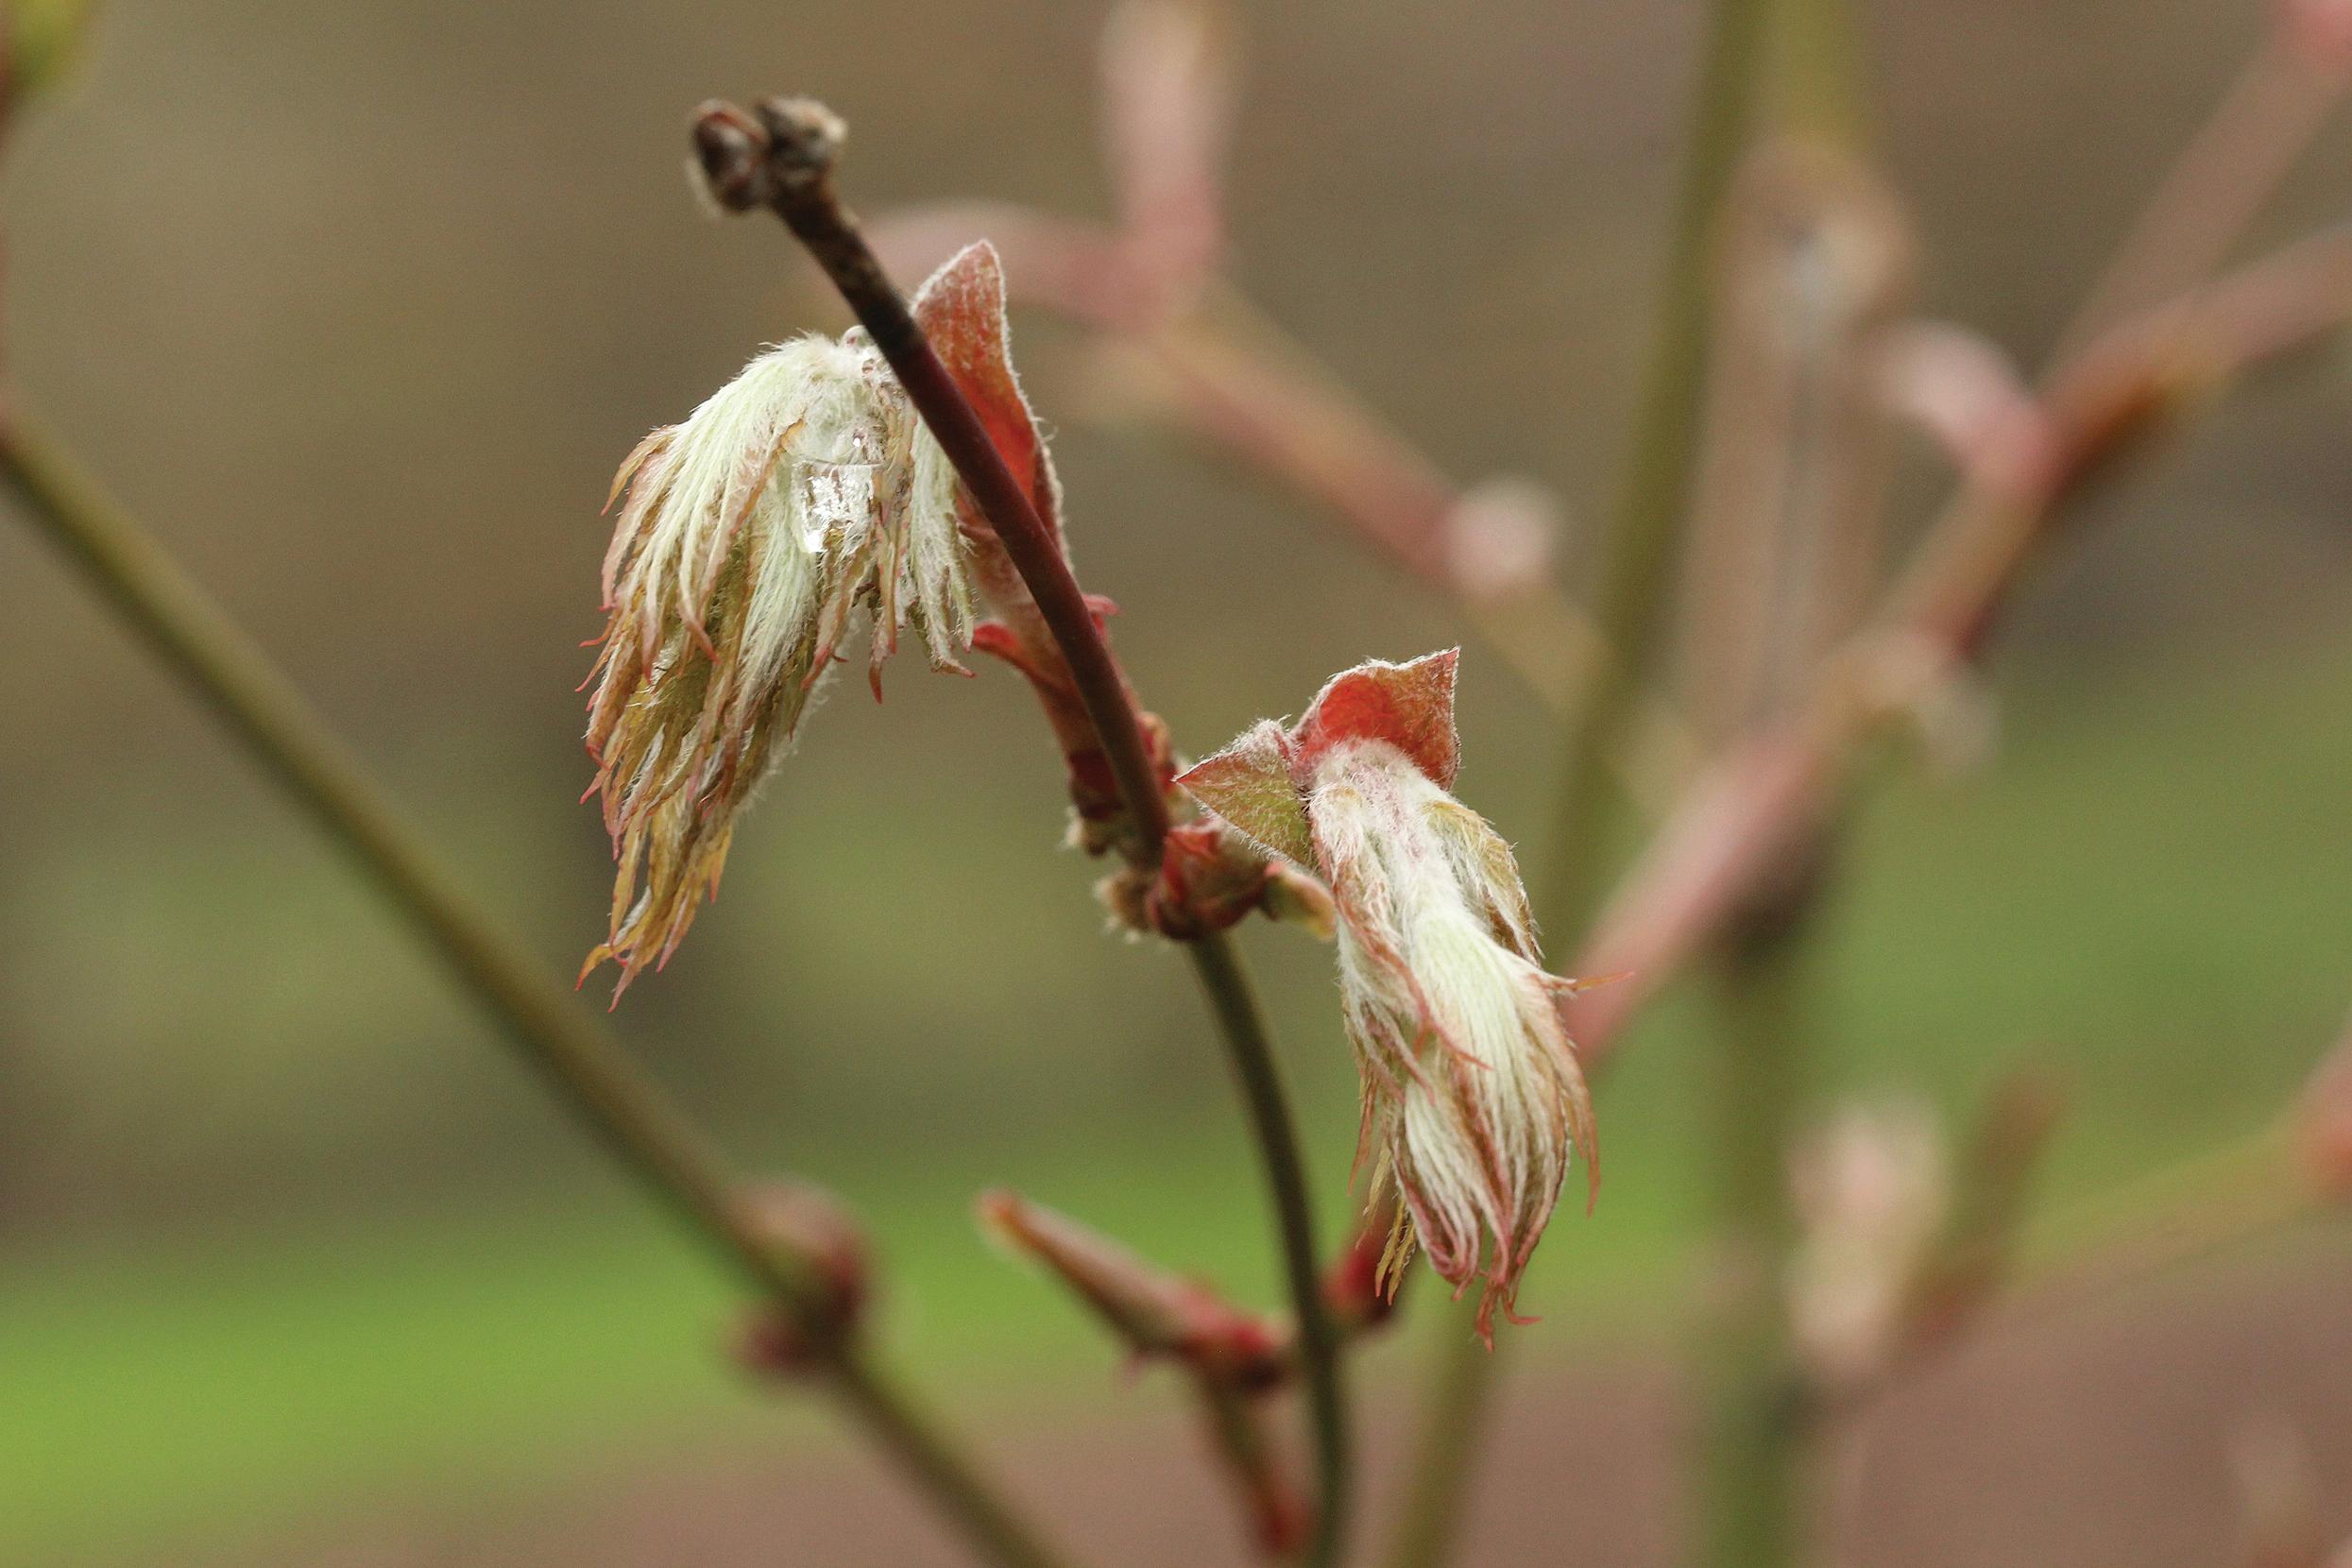 Emerging leaves of Acer ceriferum